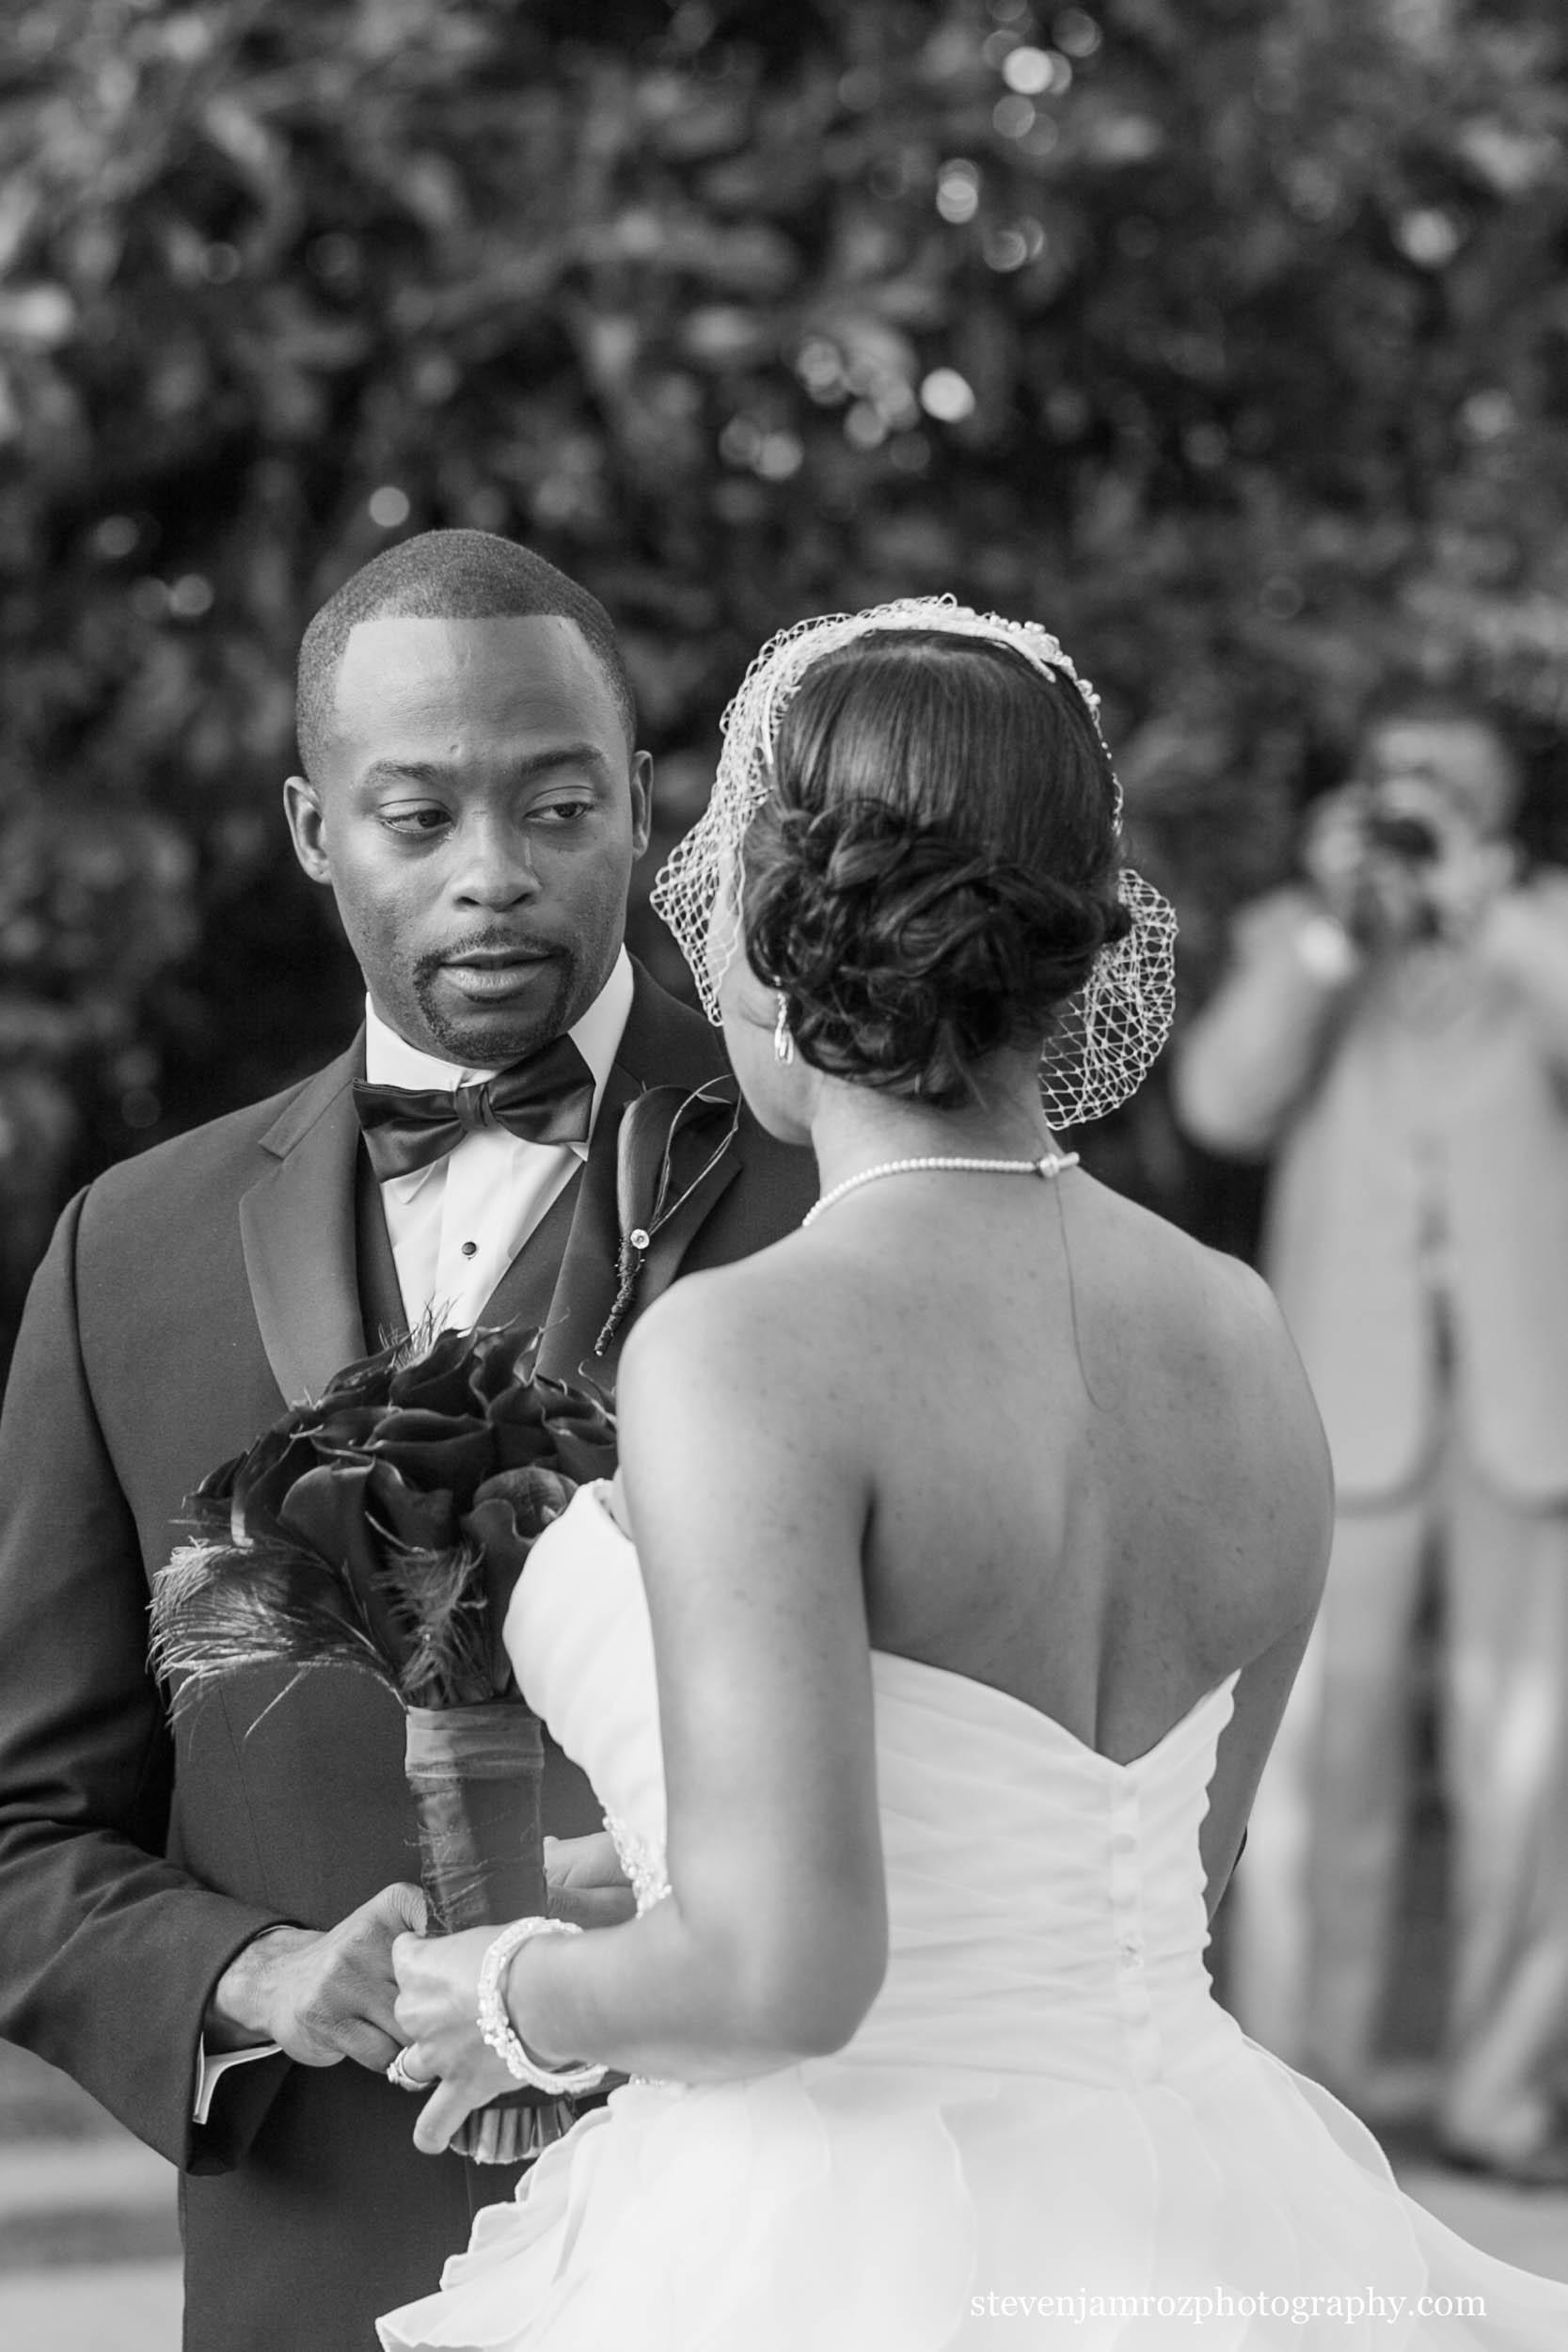 hall-at-landmark-wedding-steven-jamroz-photography-0608.jpg